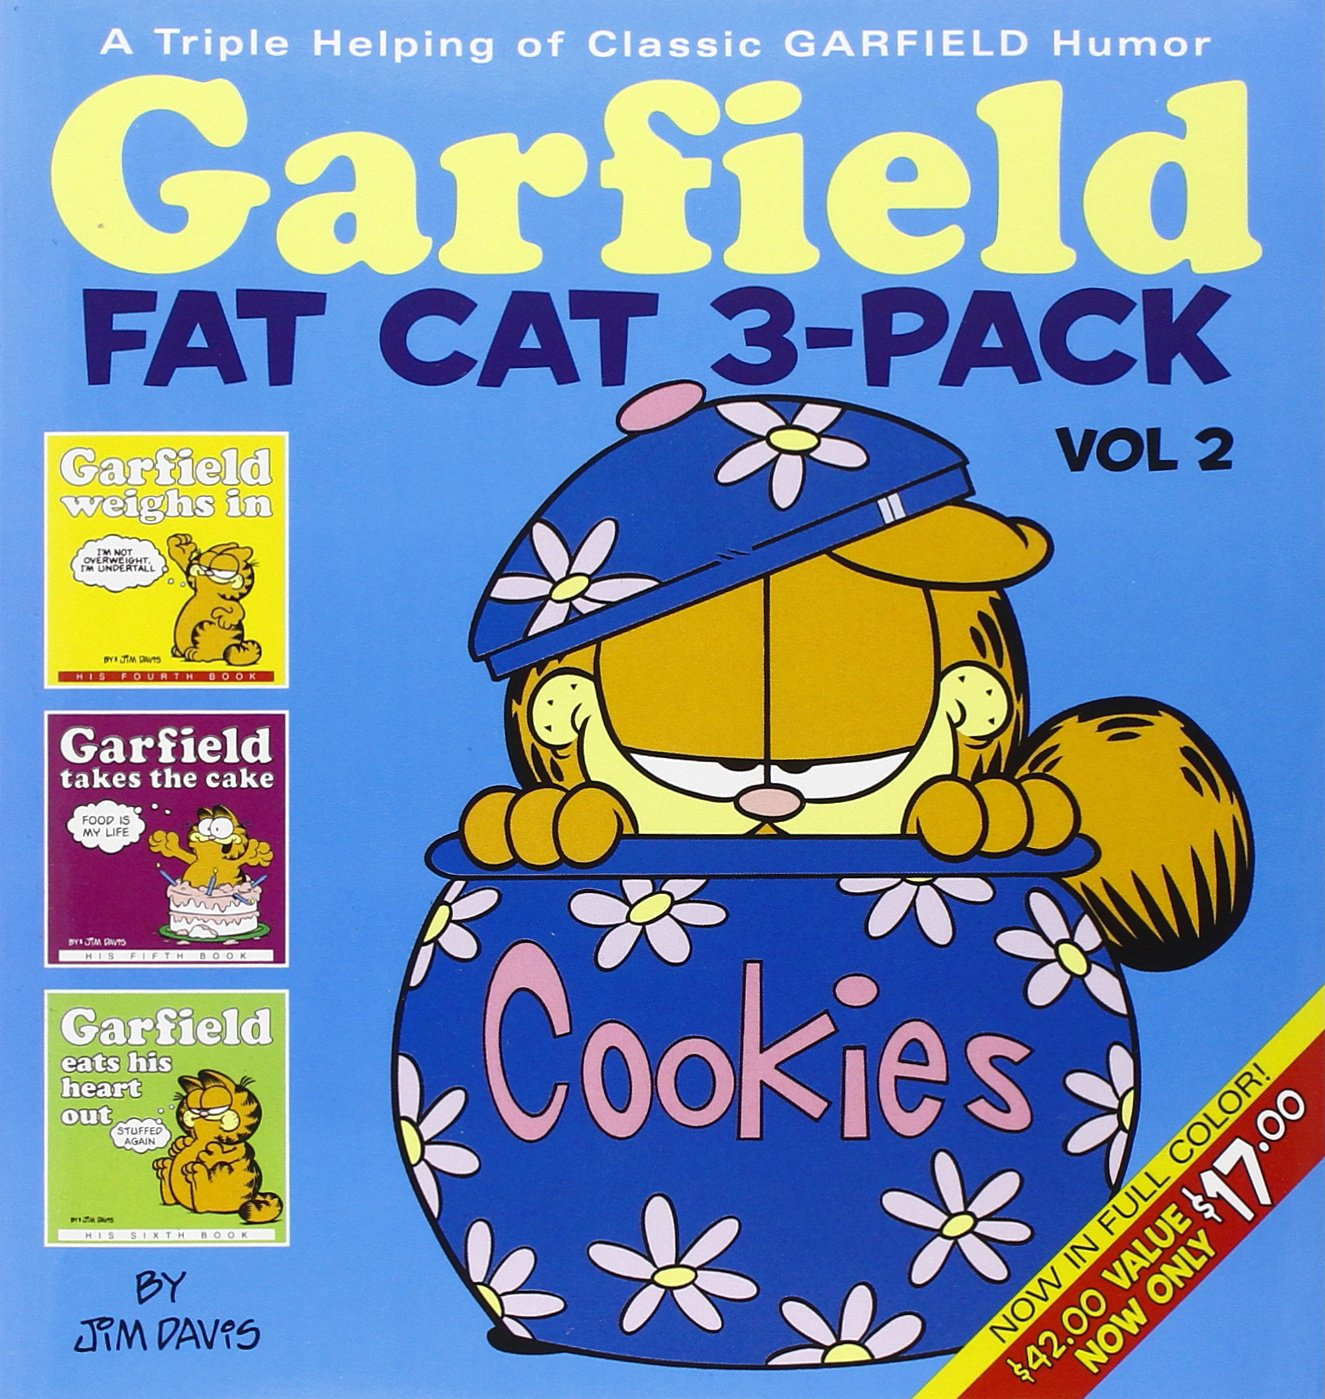 Garfield Halloween Photos (Garfield Fat Cat, Vol. 2: A Triple Helping of Classic Garfield)